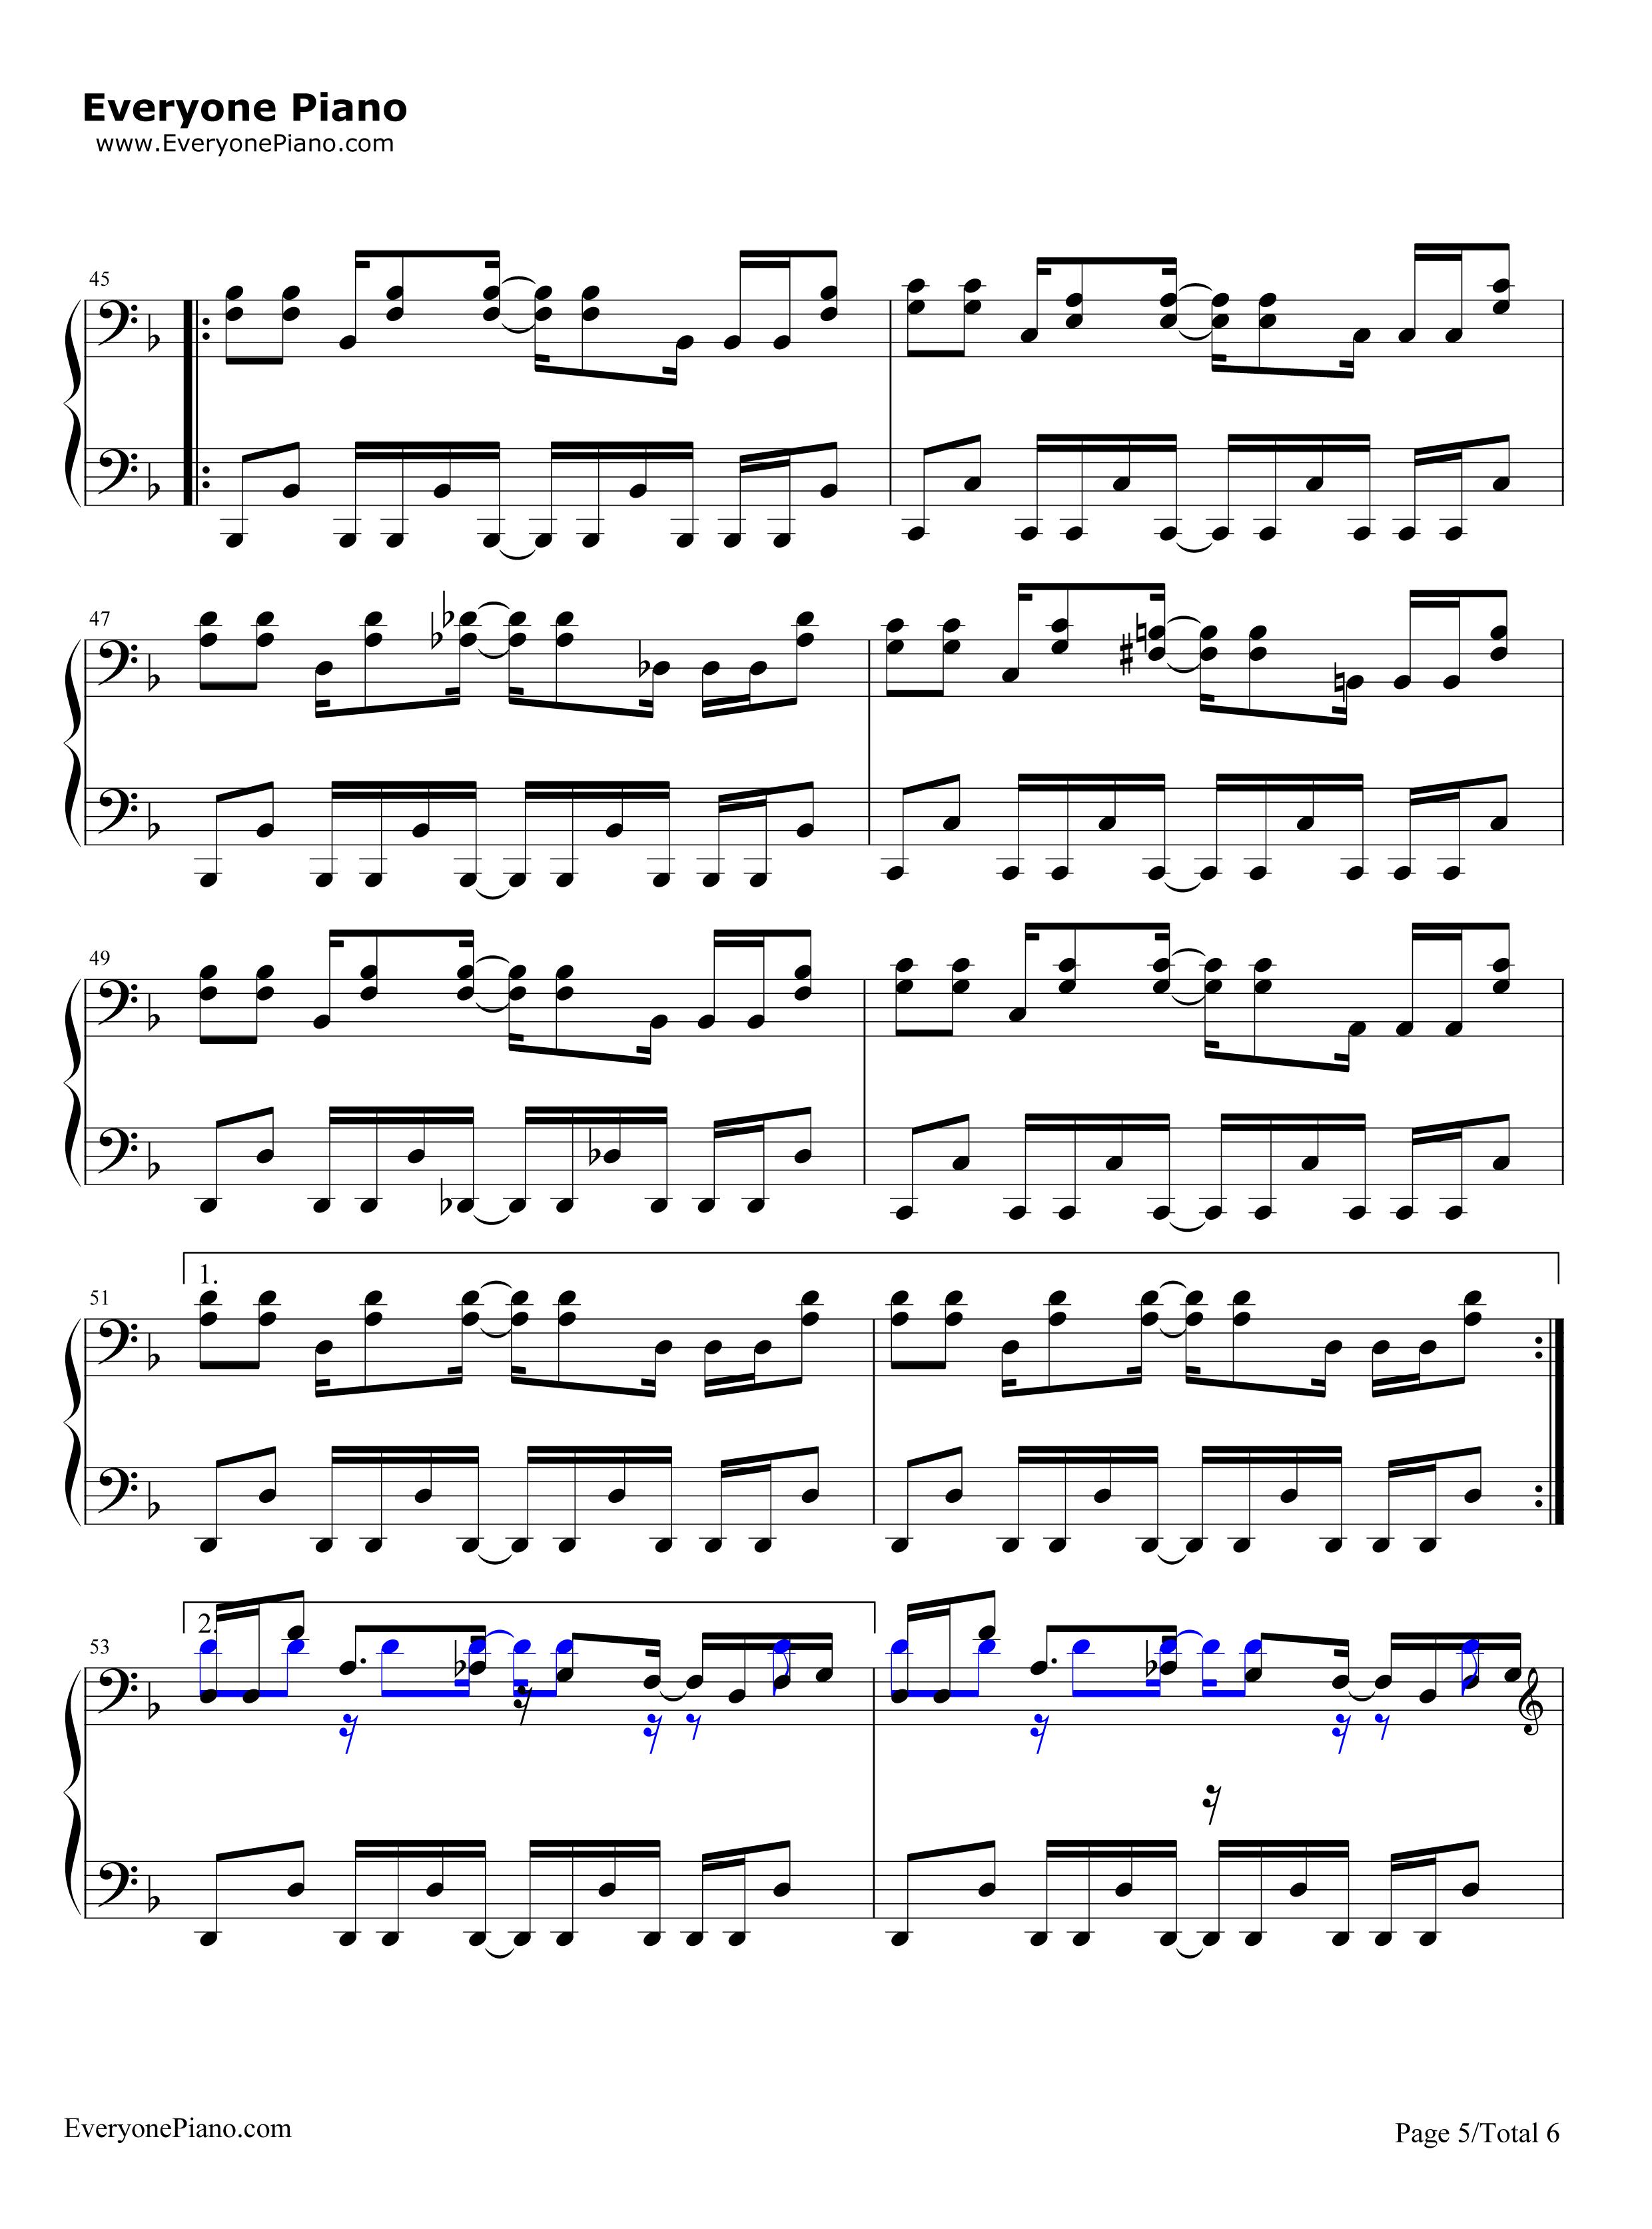 ania口琴谱undertale-megalovania口琴谱